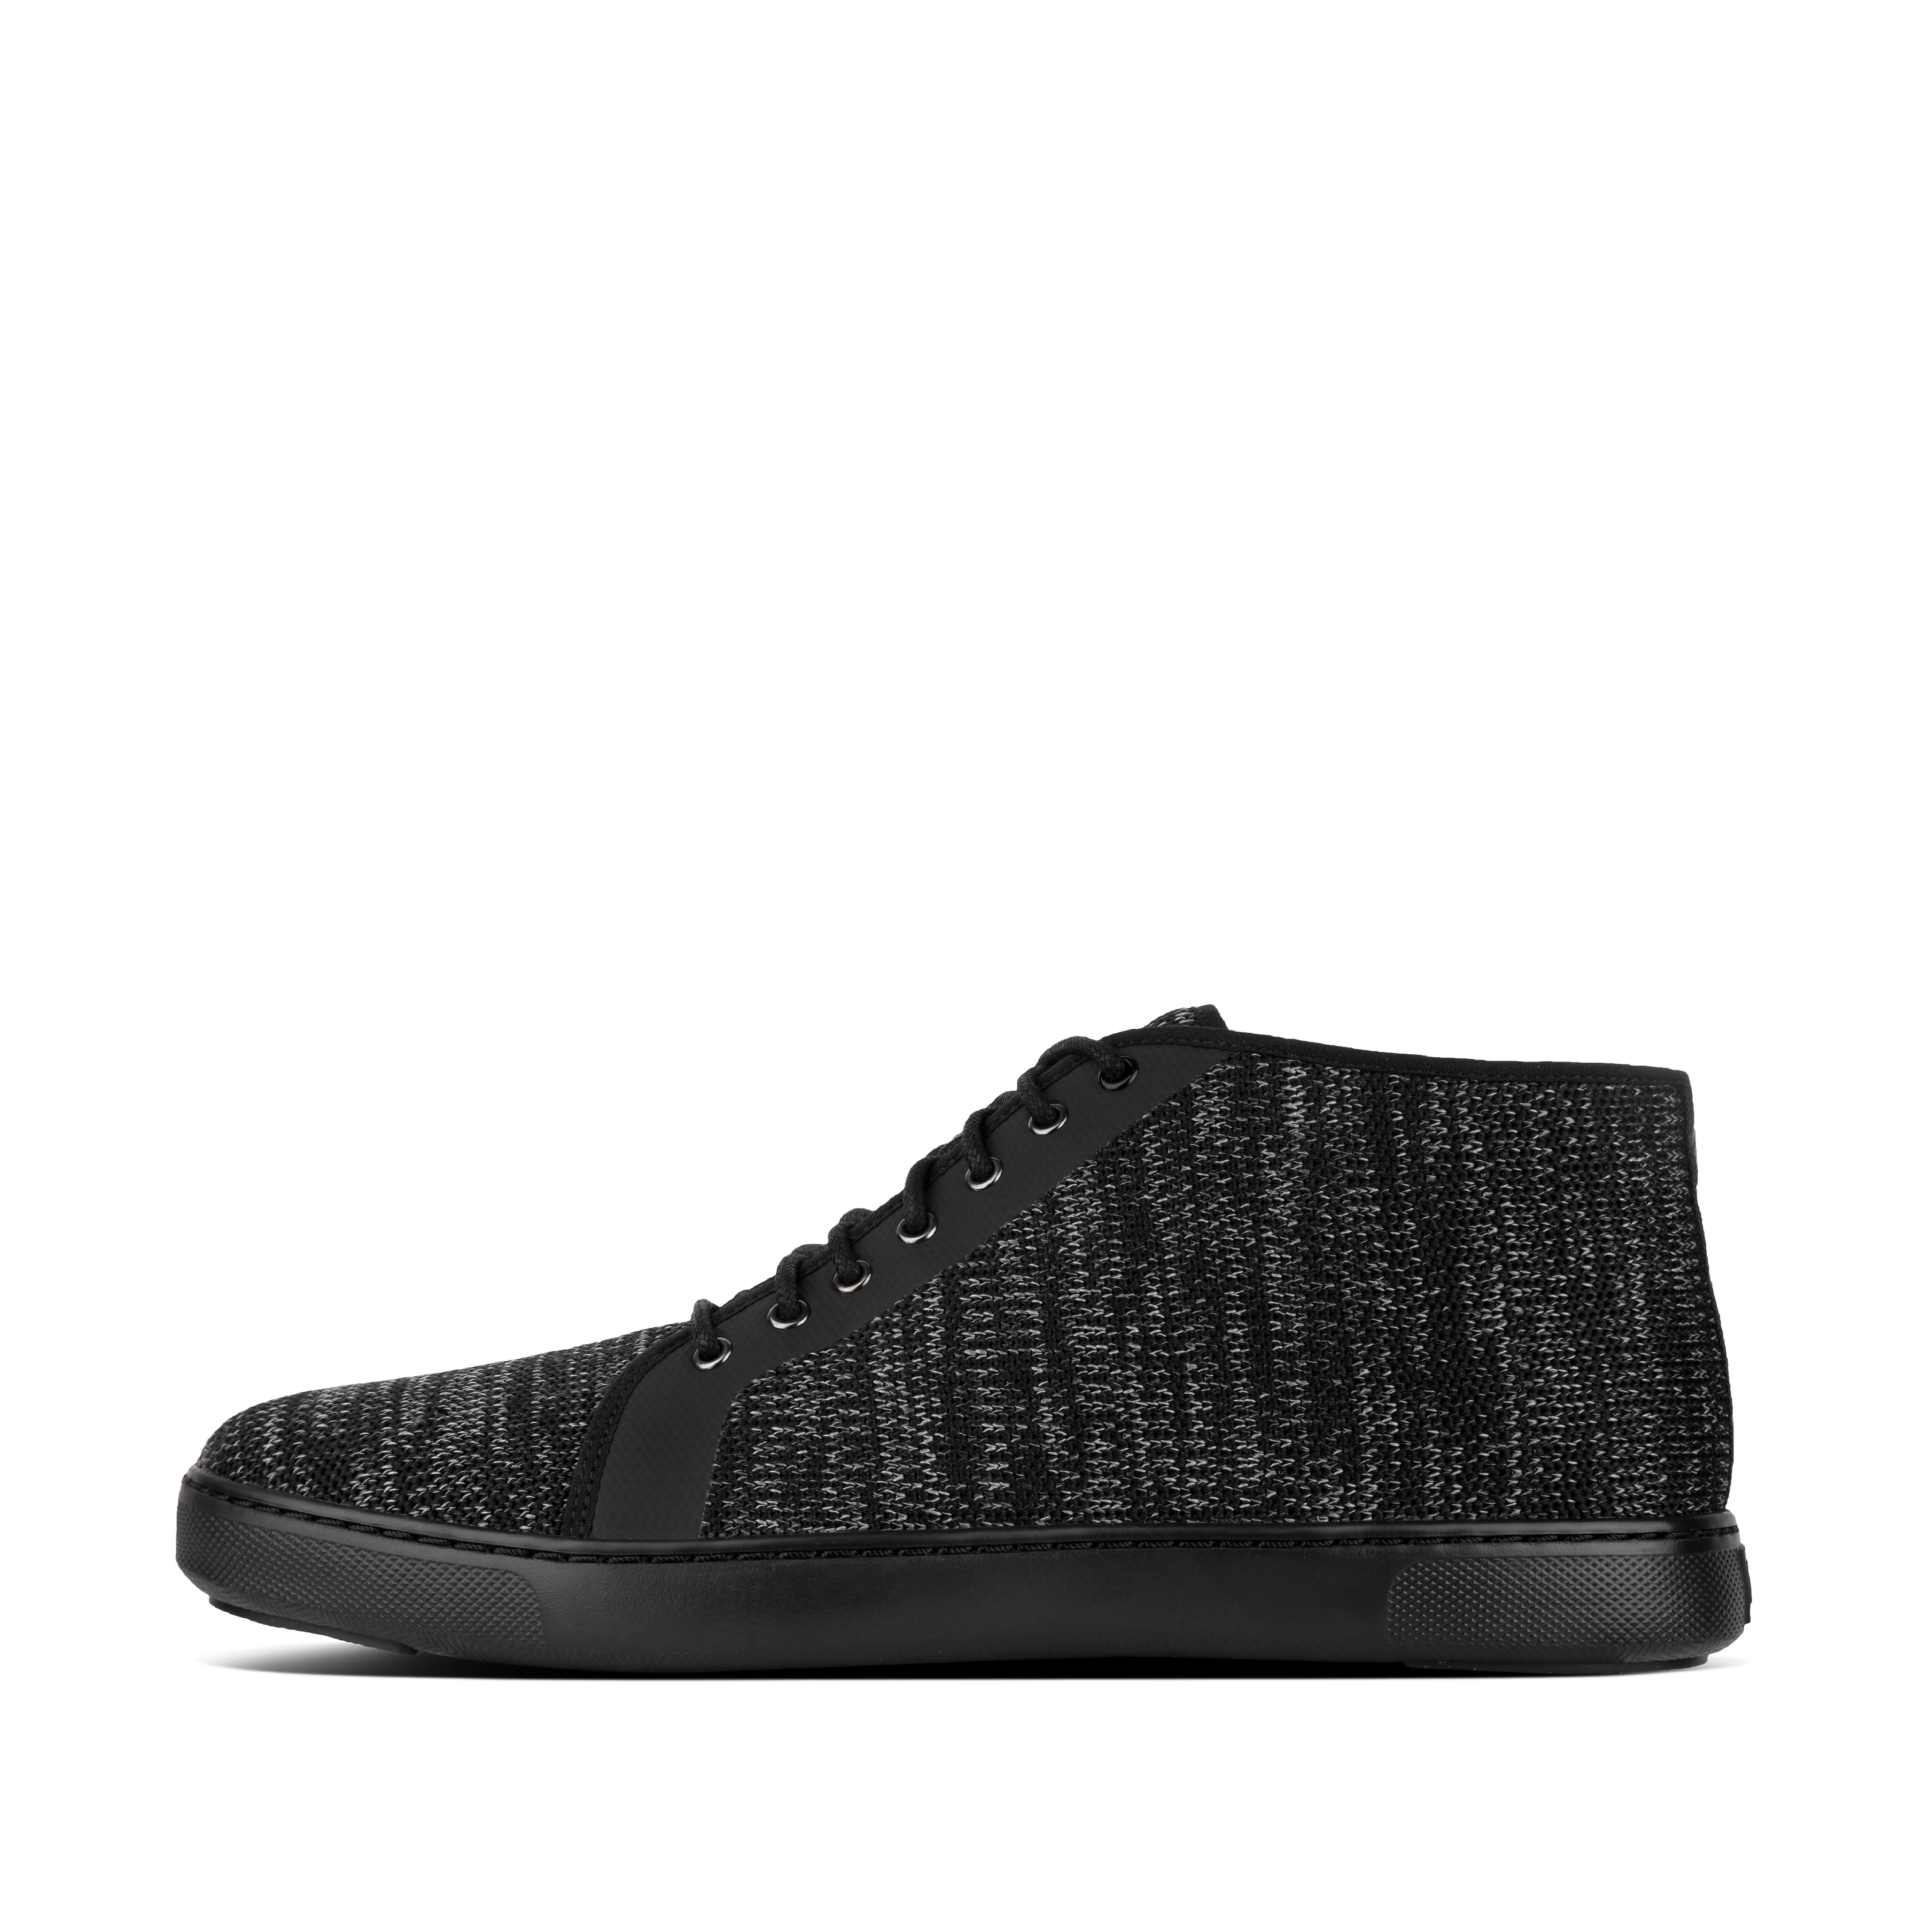 Andor knit sneaker black m89 001?v=3